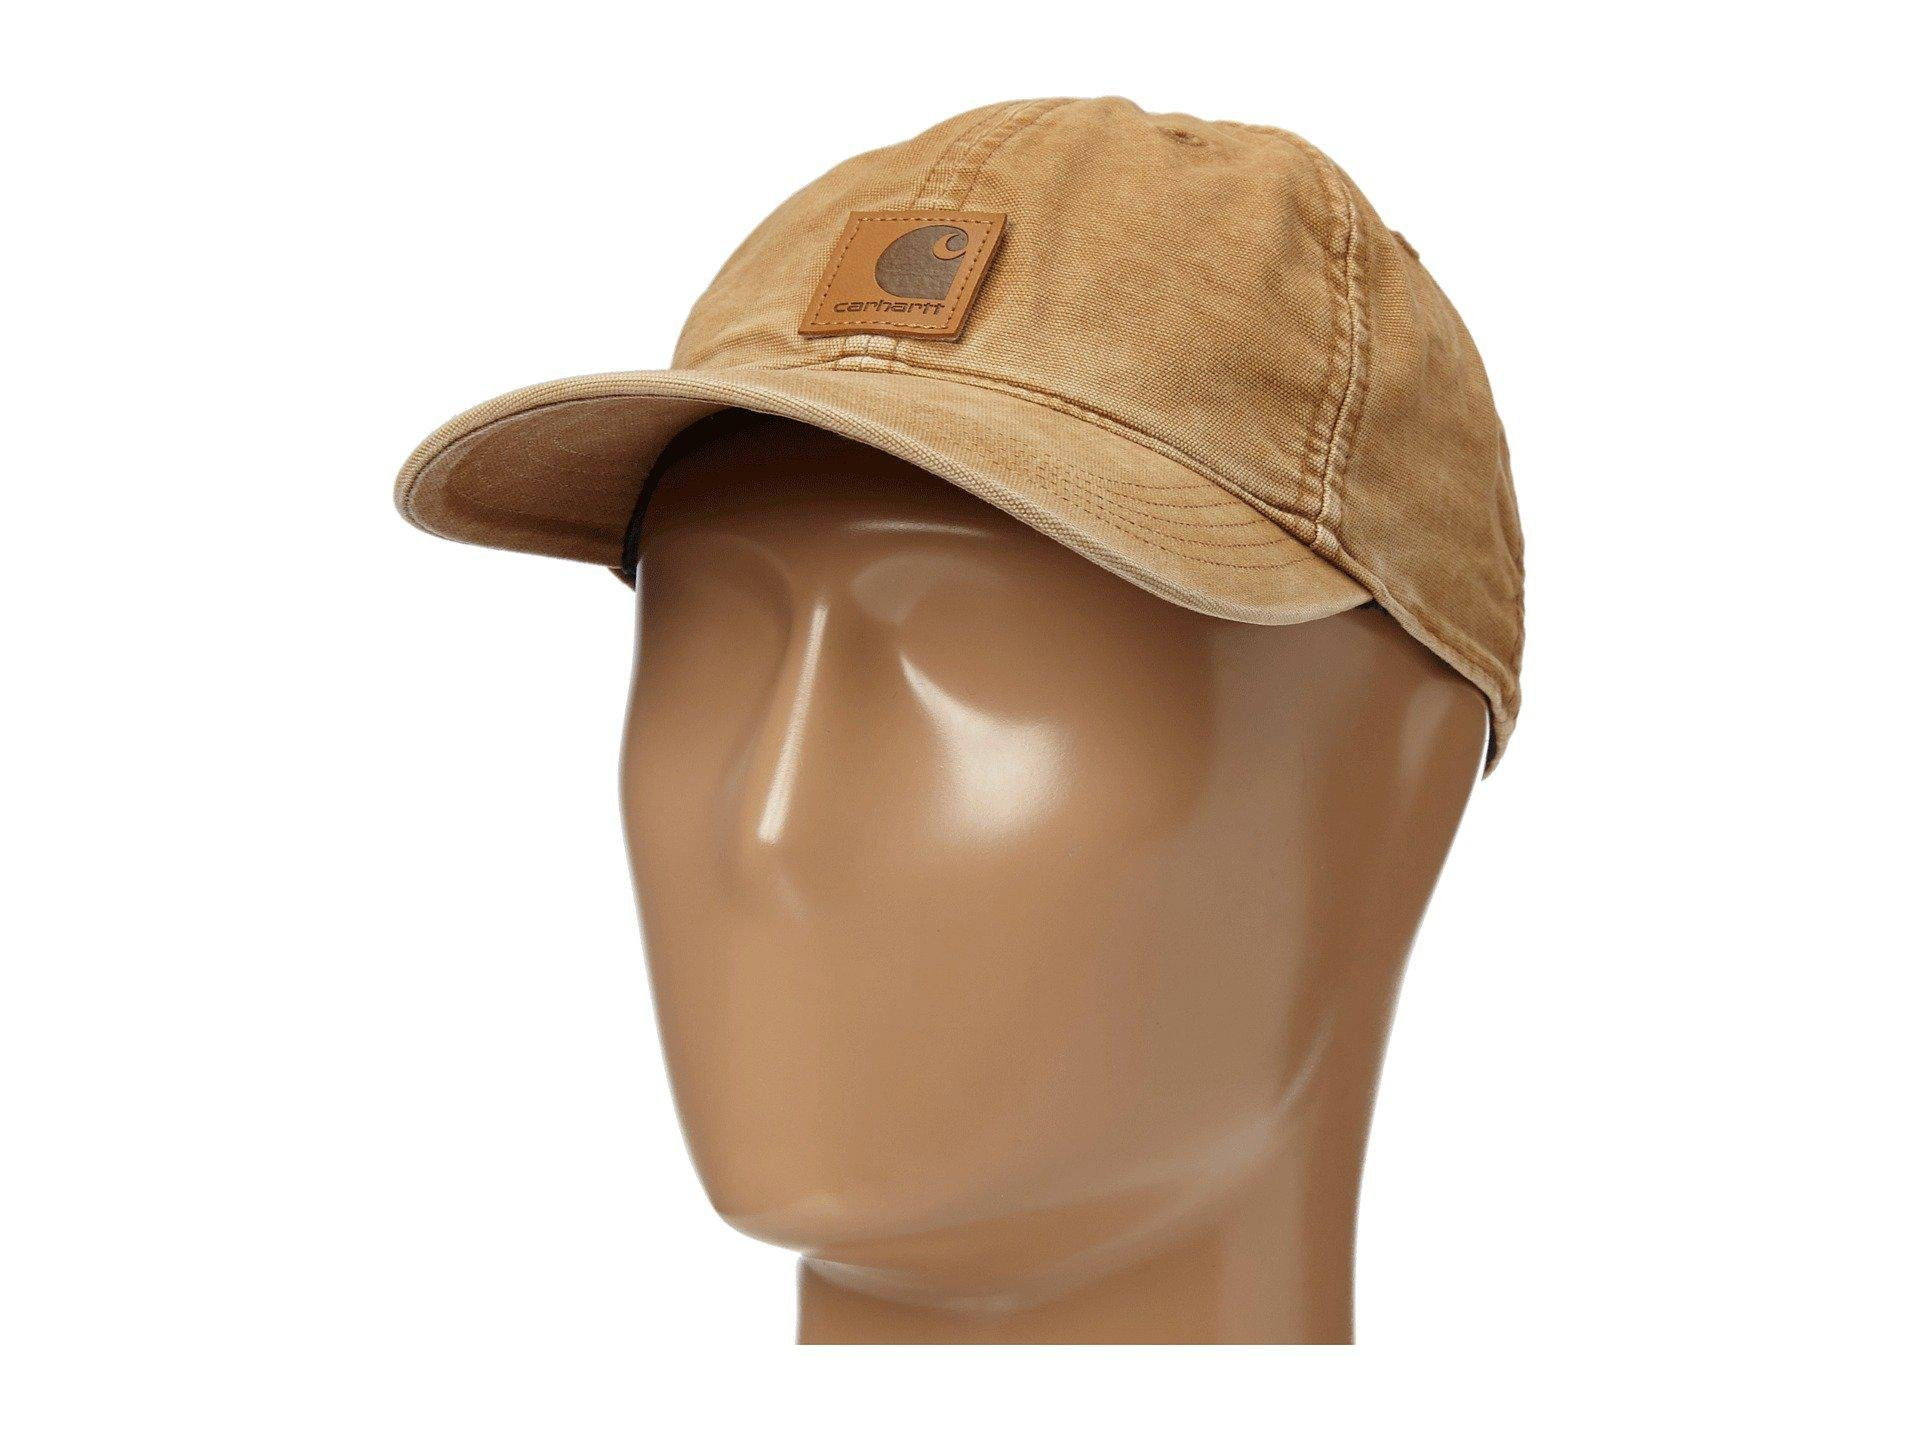 Lyst - Carhartt Odessa Cap in Brown for Men fd610590bbe5